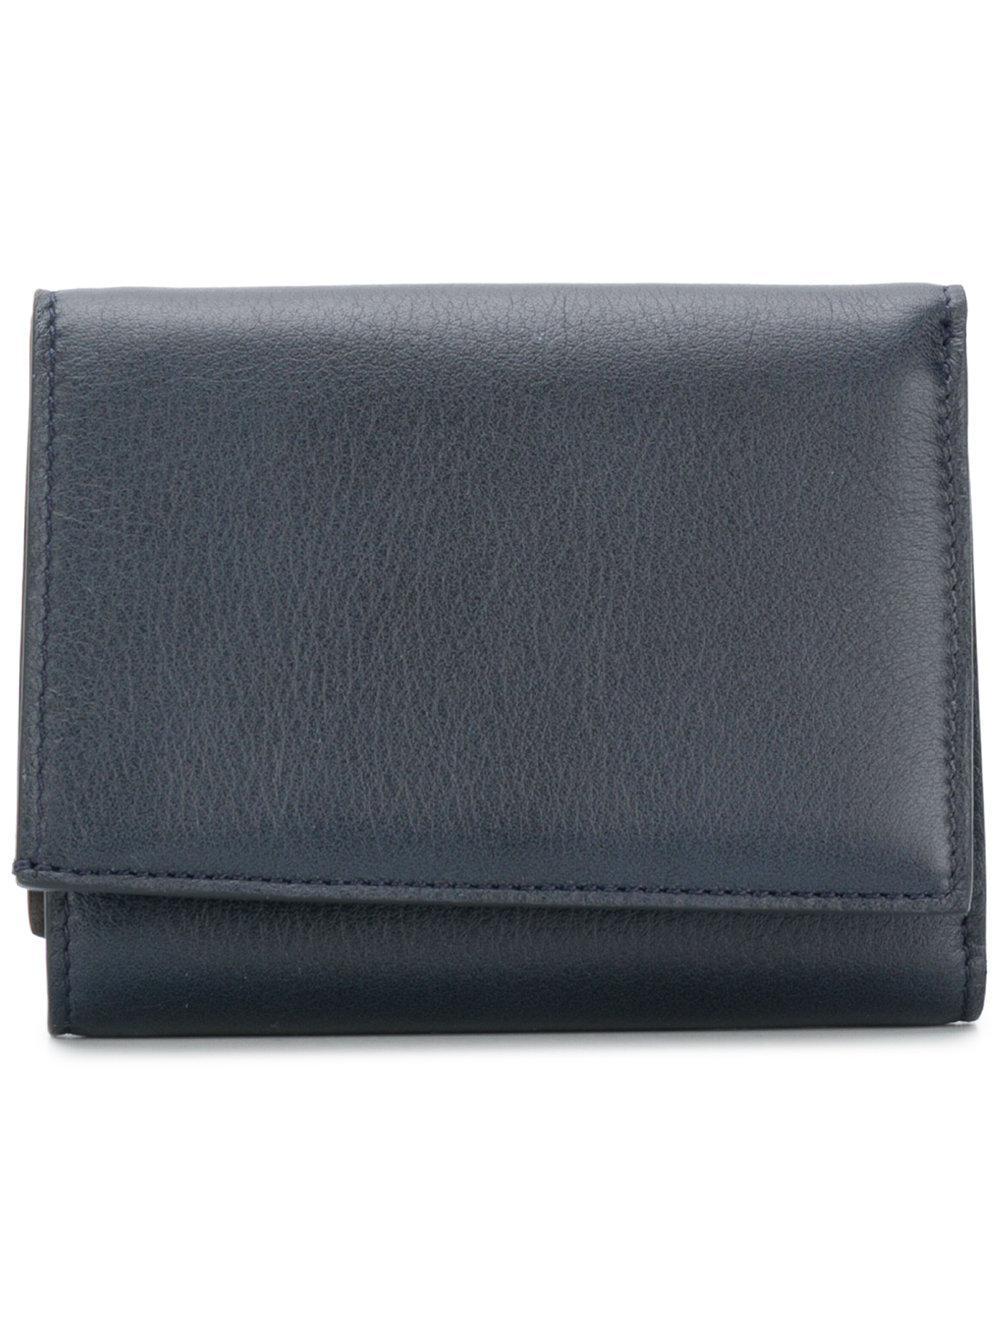 Maison Margiela Casual Foldover Wallet - Blue